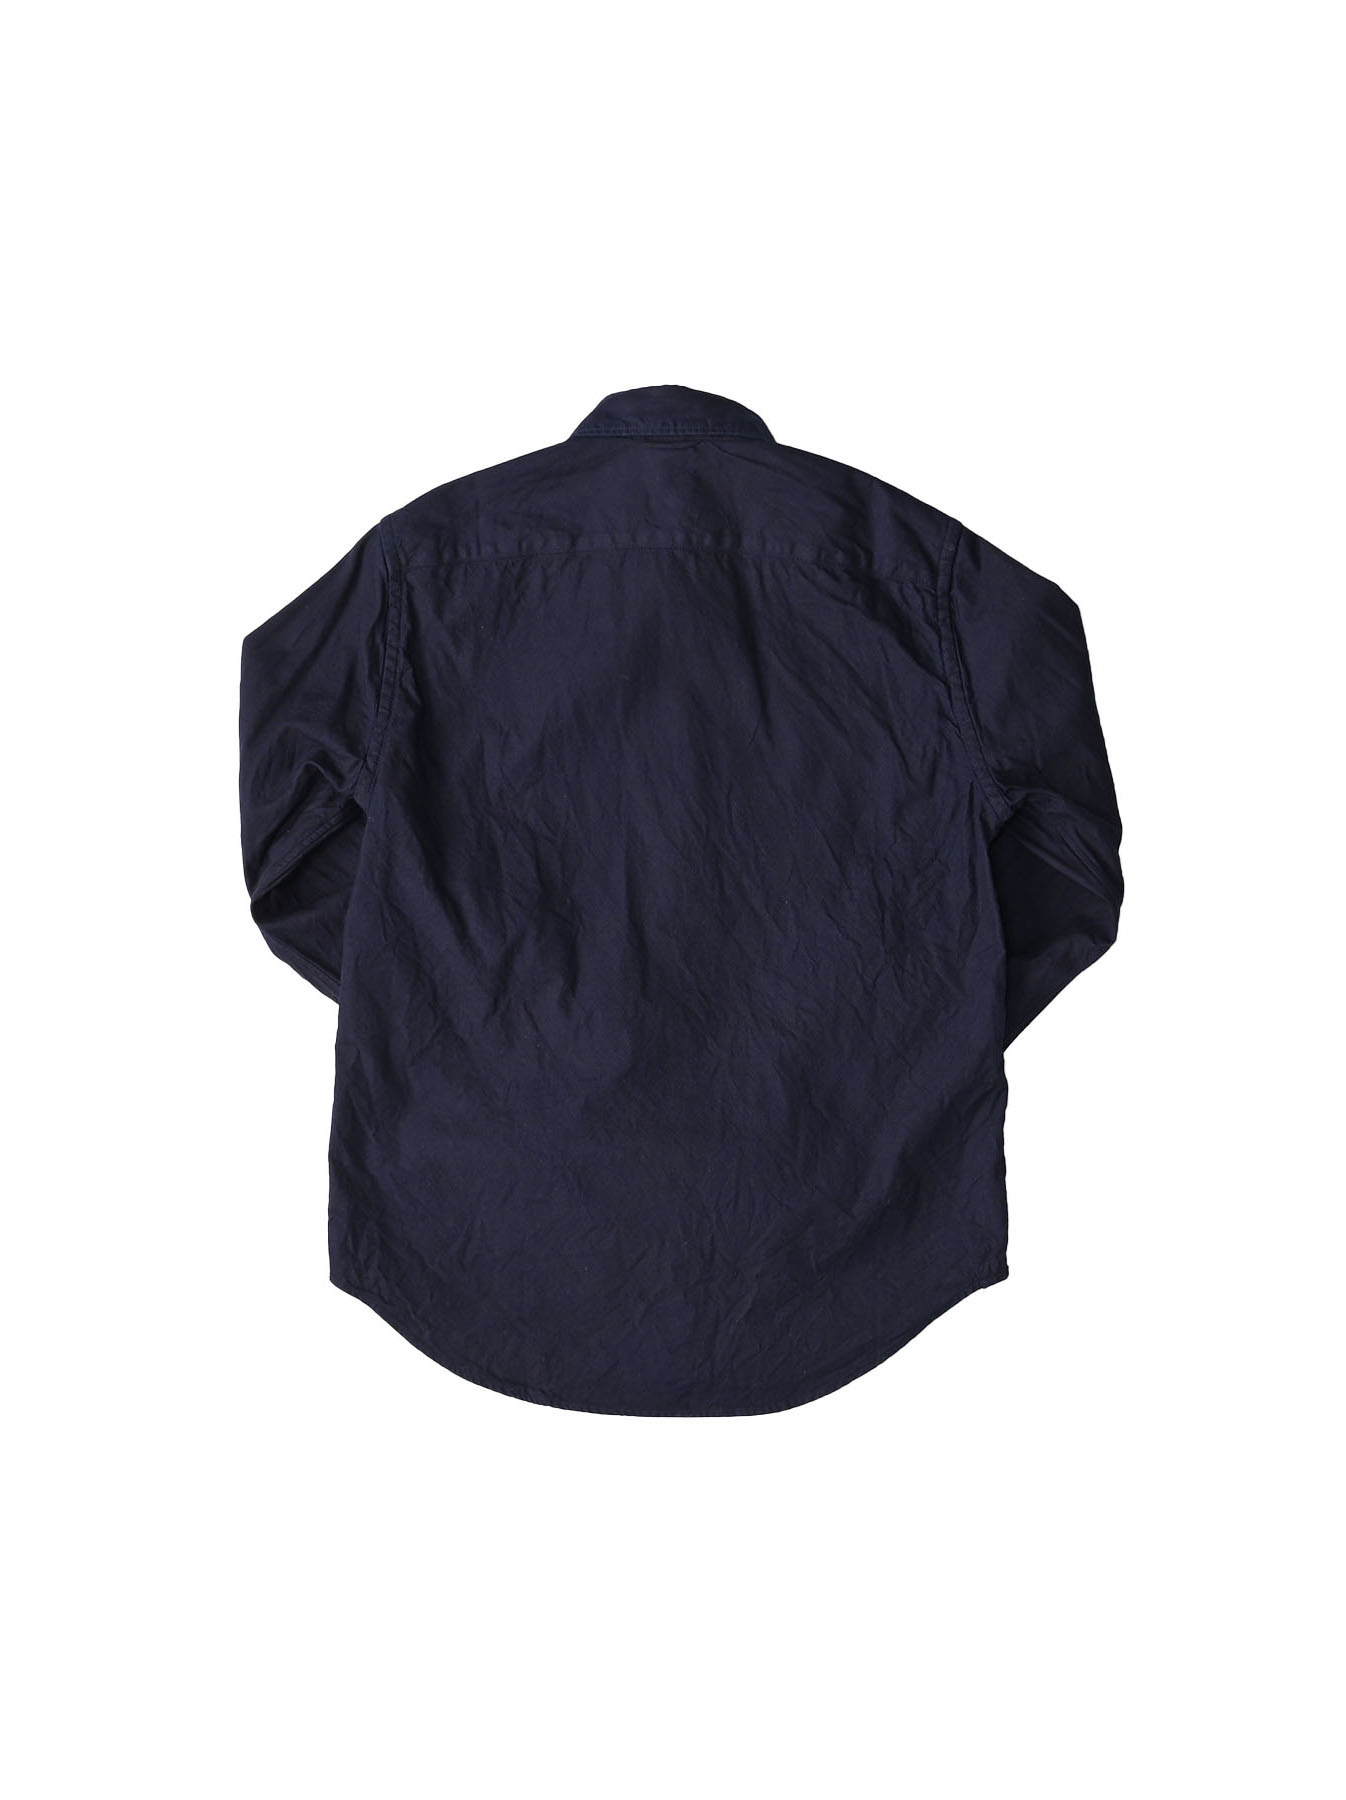 Indigo  Zimbabwe Oxford 908 Regular Shirt-10